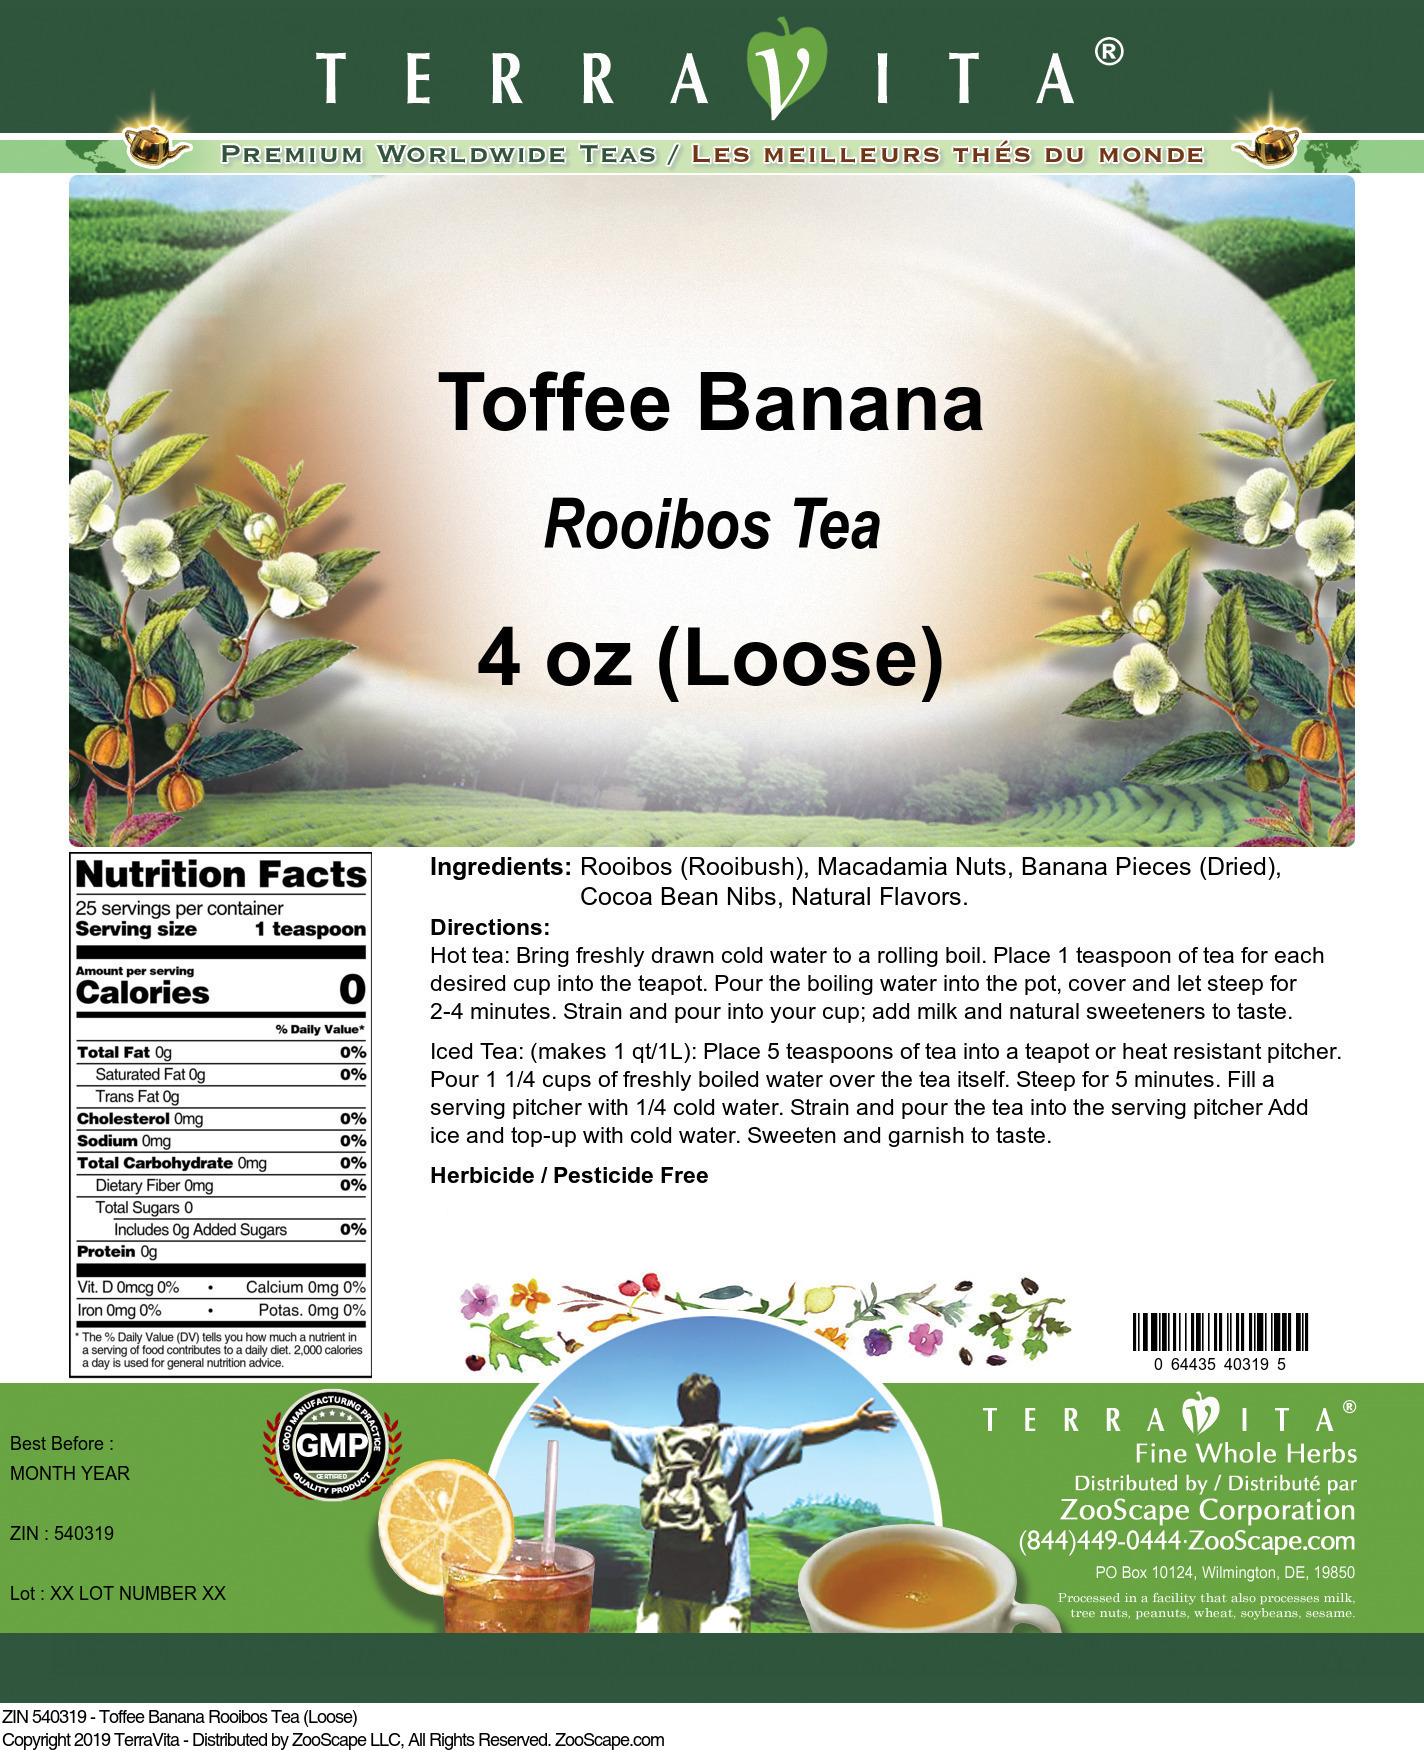 Toffee Banana Rooibos Tea